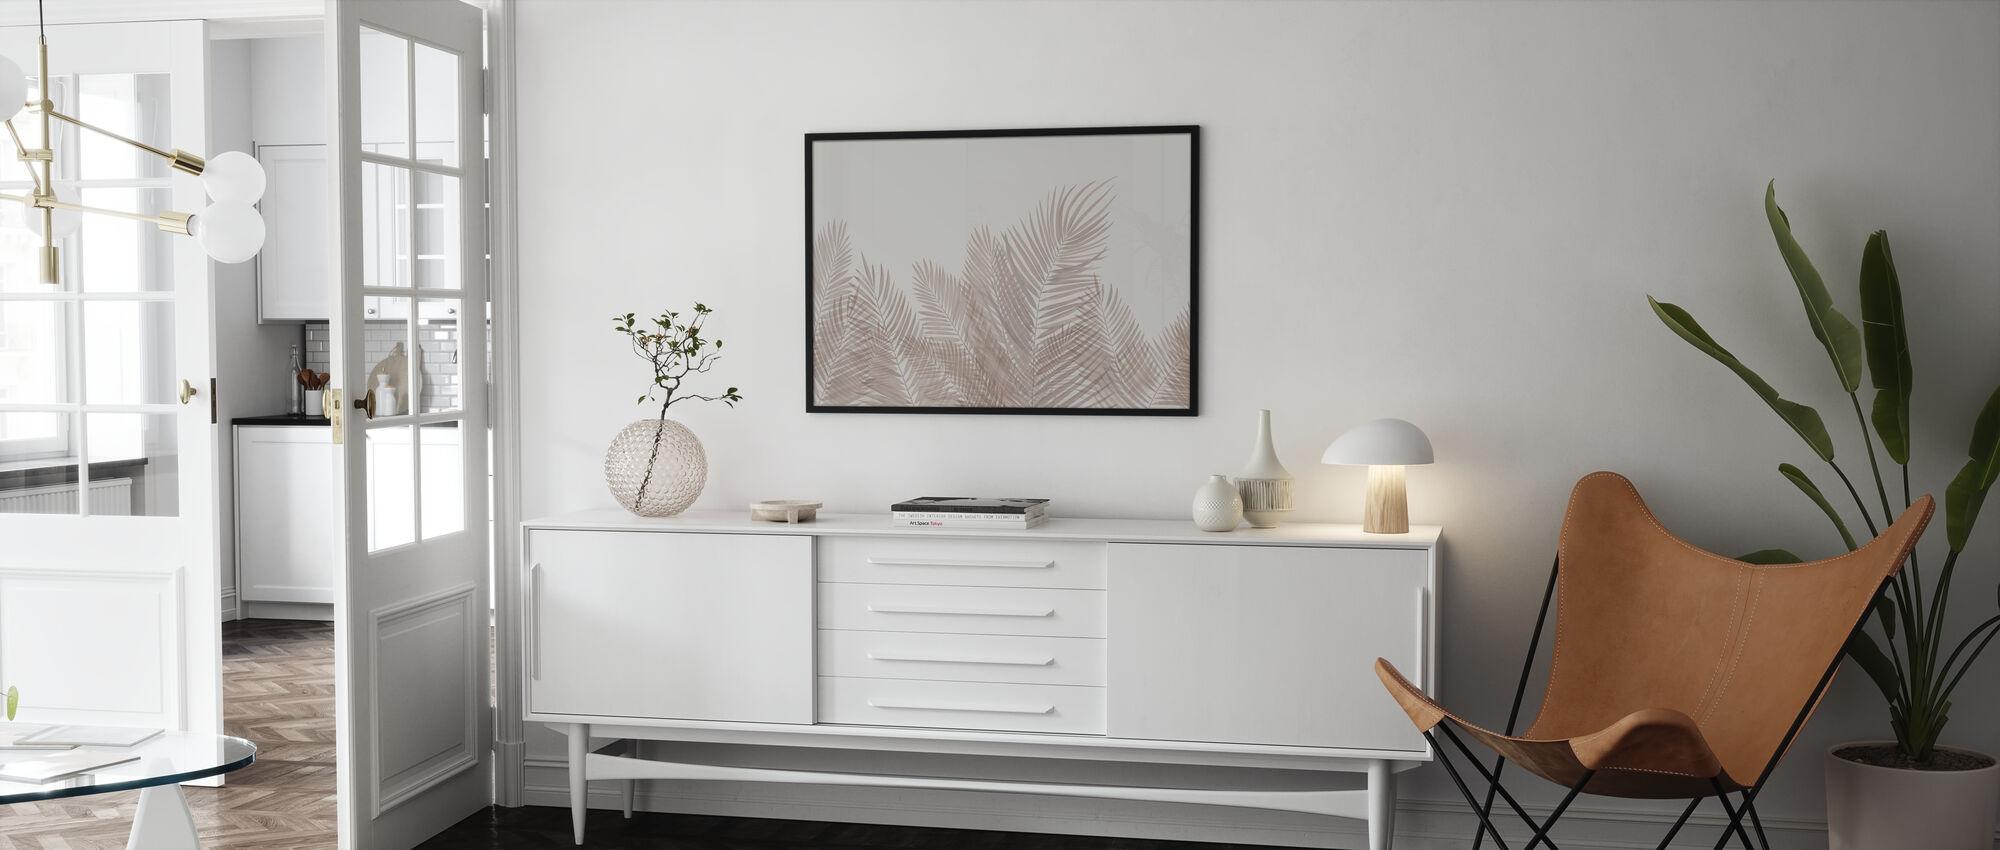 Swaying Palm Leaves - Sepia - Framed print - Living Room